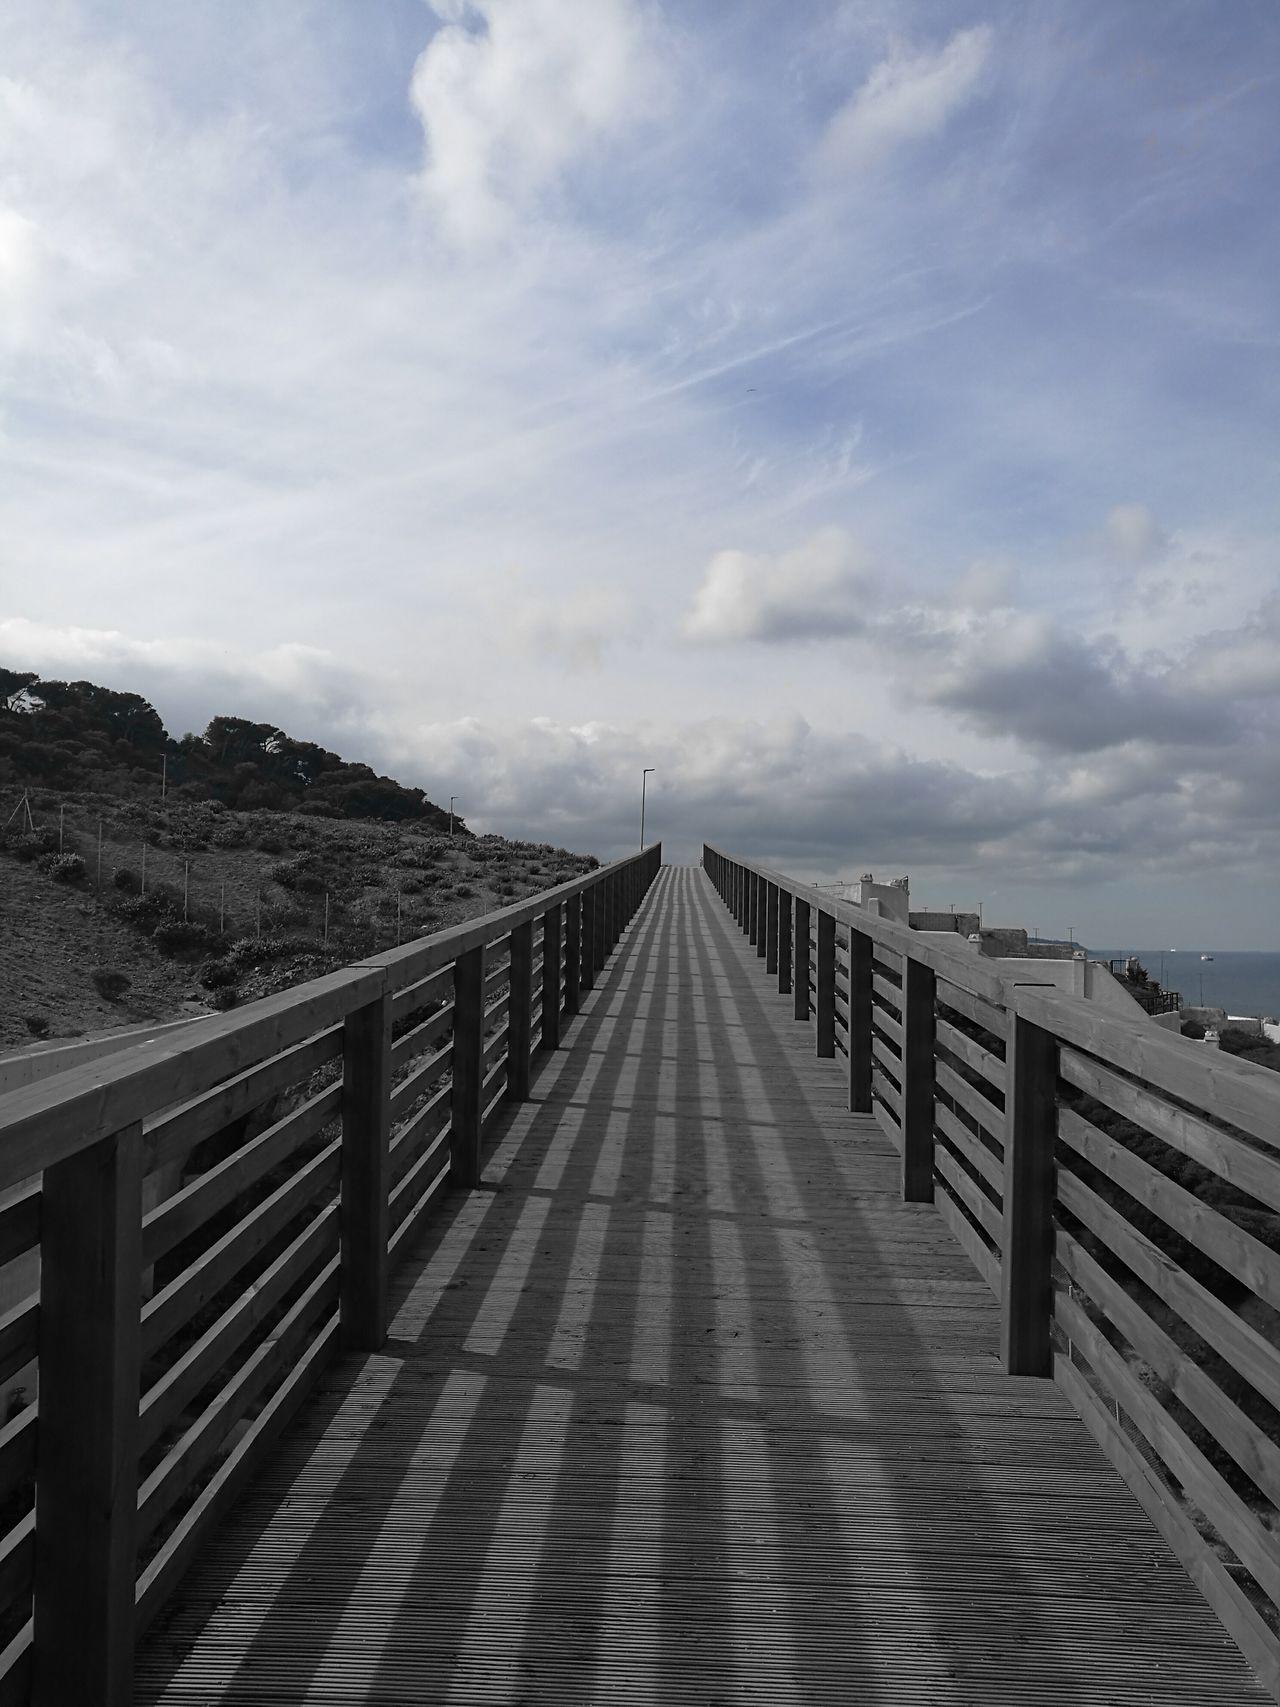 Puentes Road To Heaven No People